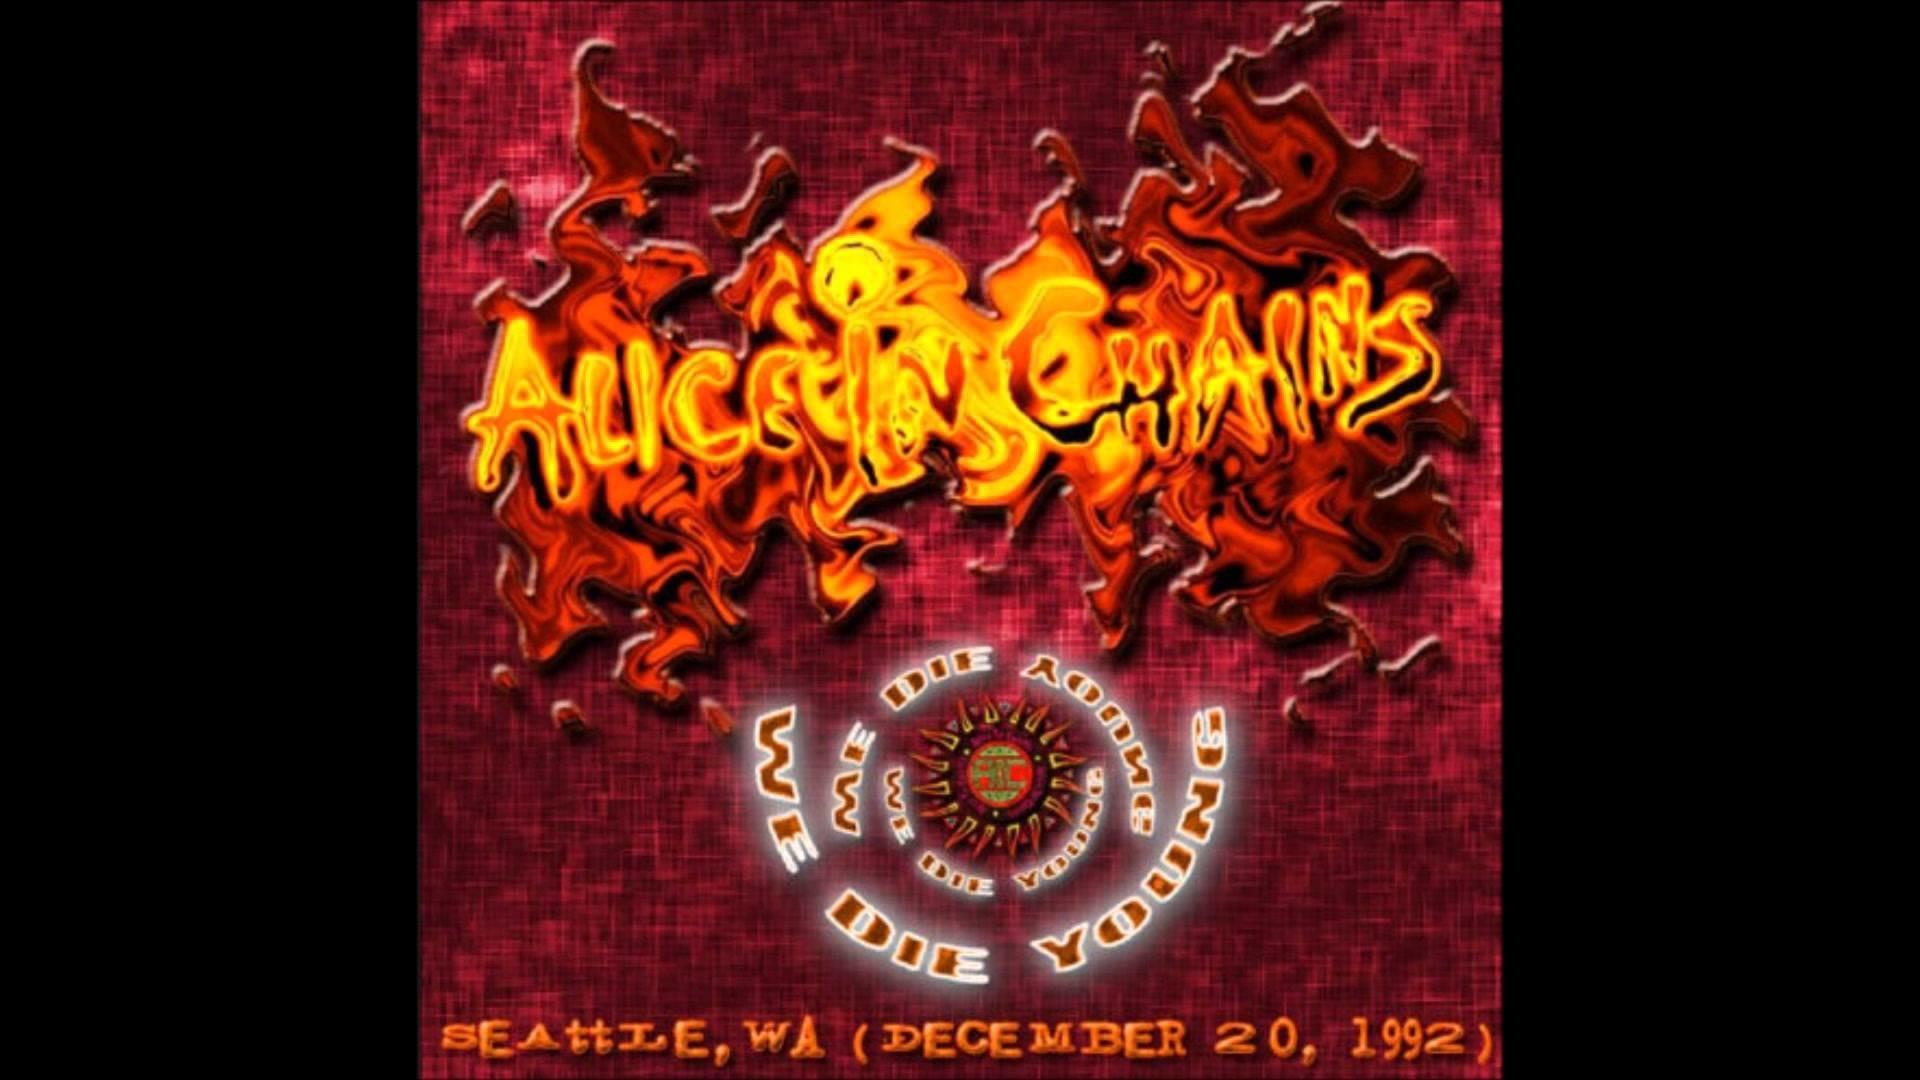 download alice in chains full album